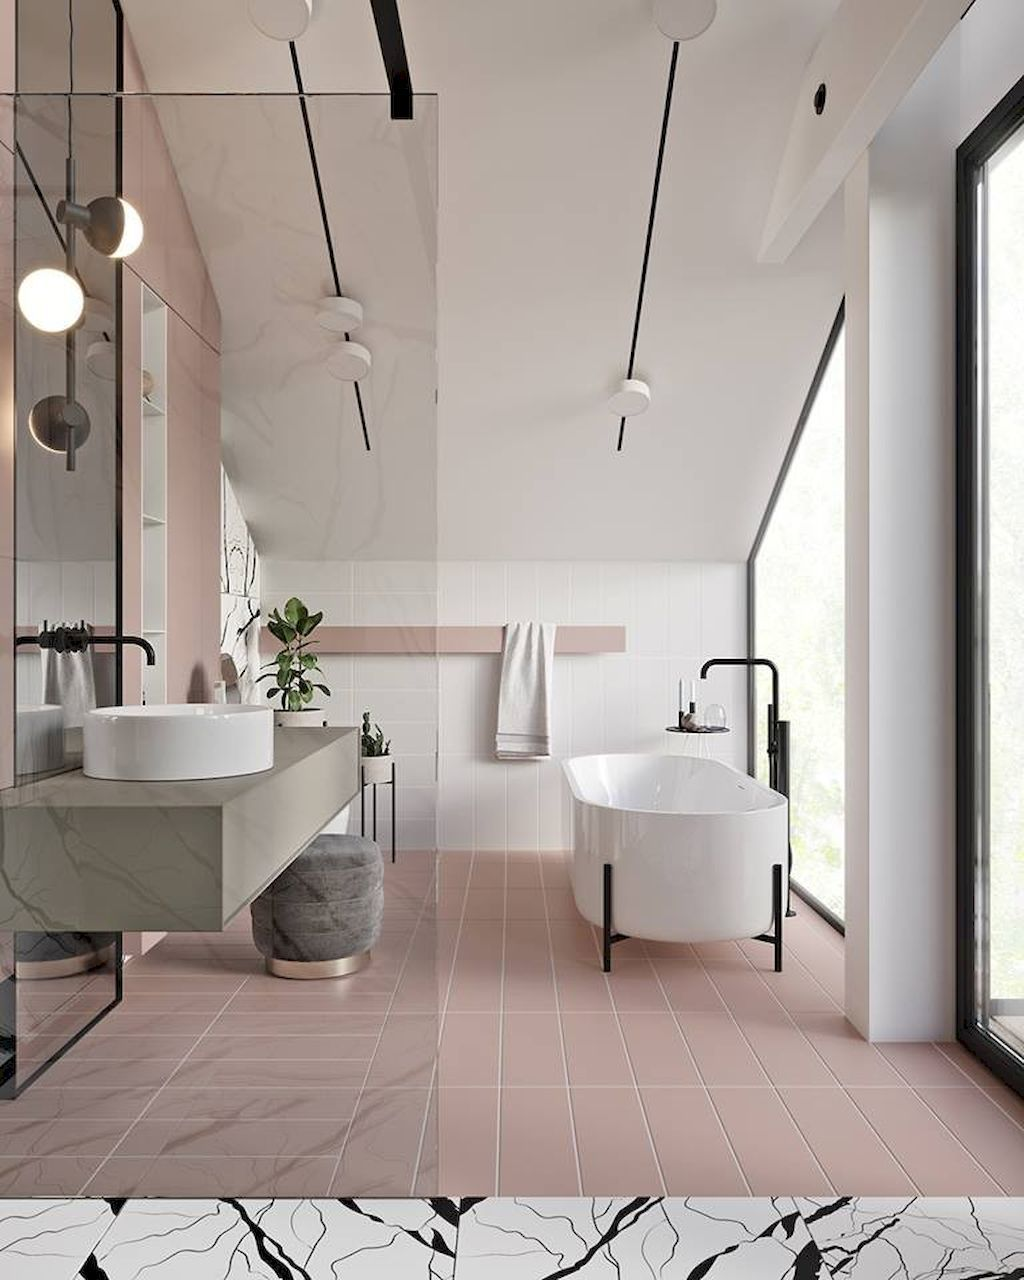 93 cool black and white bathroom design ideas bathroom ideas remodel pinterest. Black Bedroom Furniture Sets. Home Design Ideas